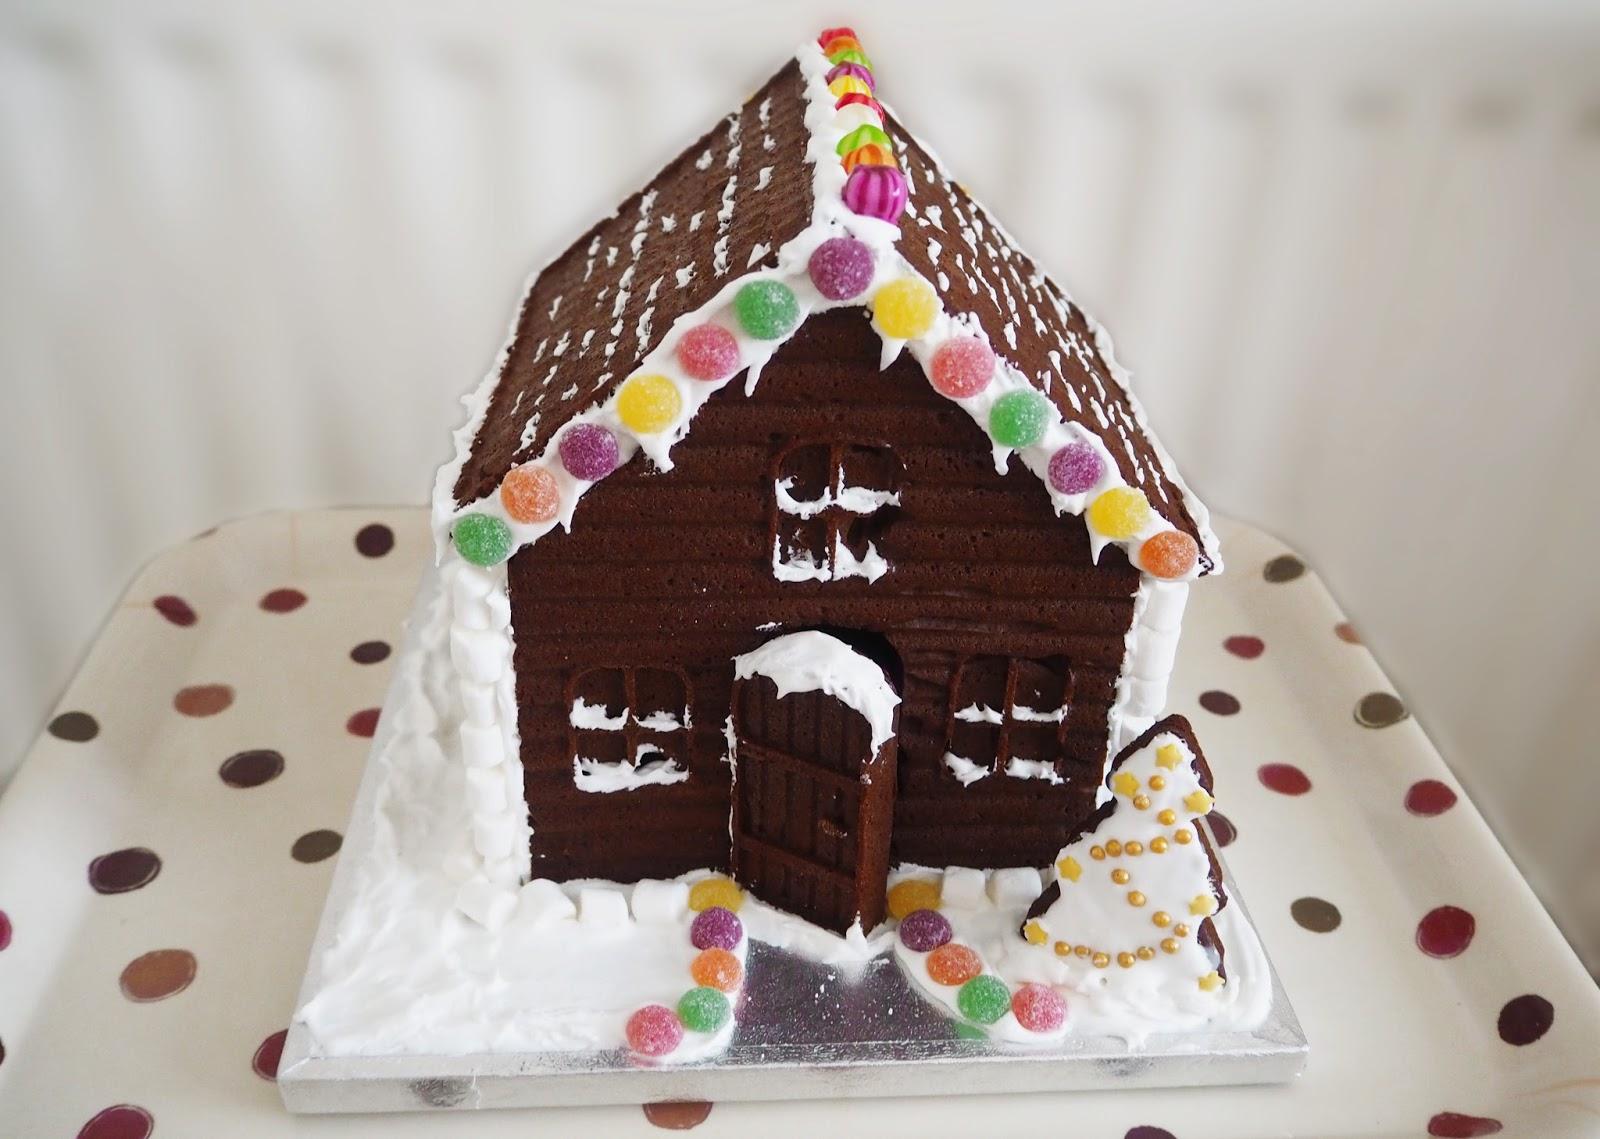 Homemade Gingerbread House | Katie Kirk Loves